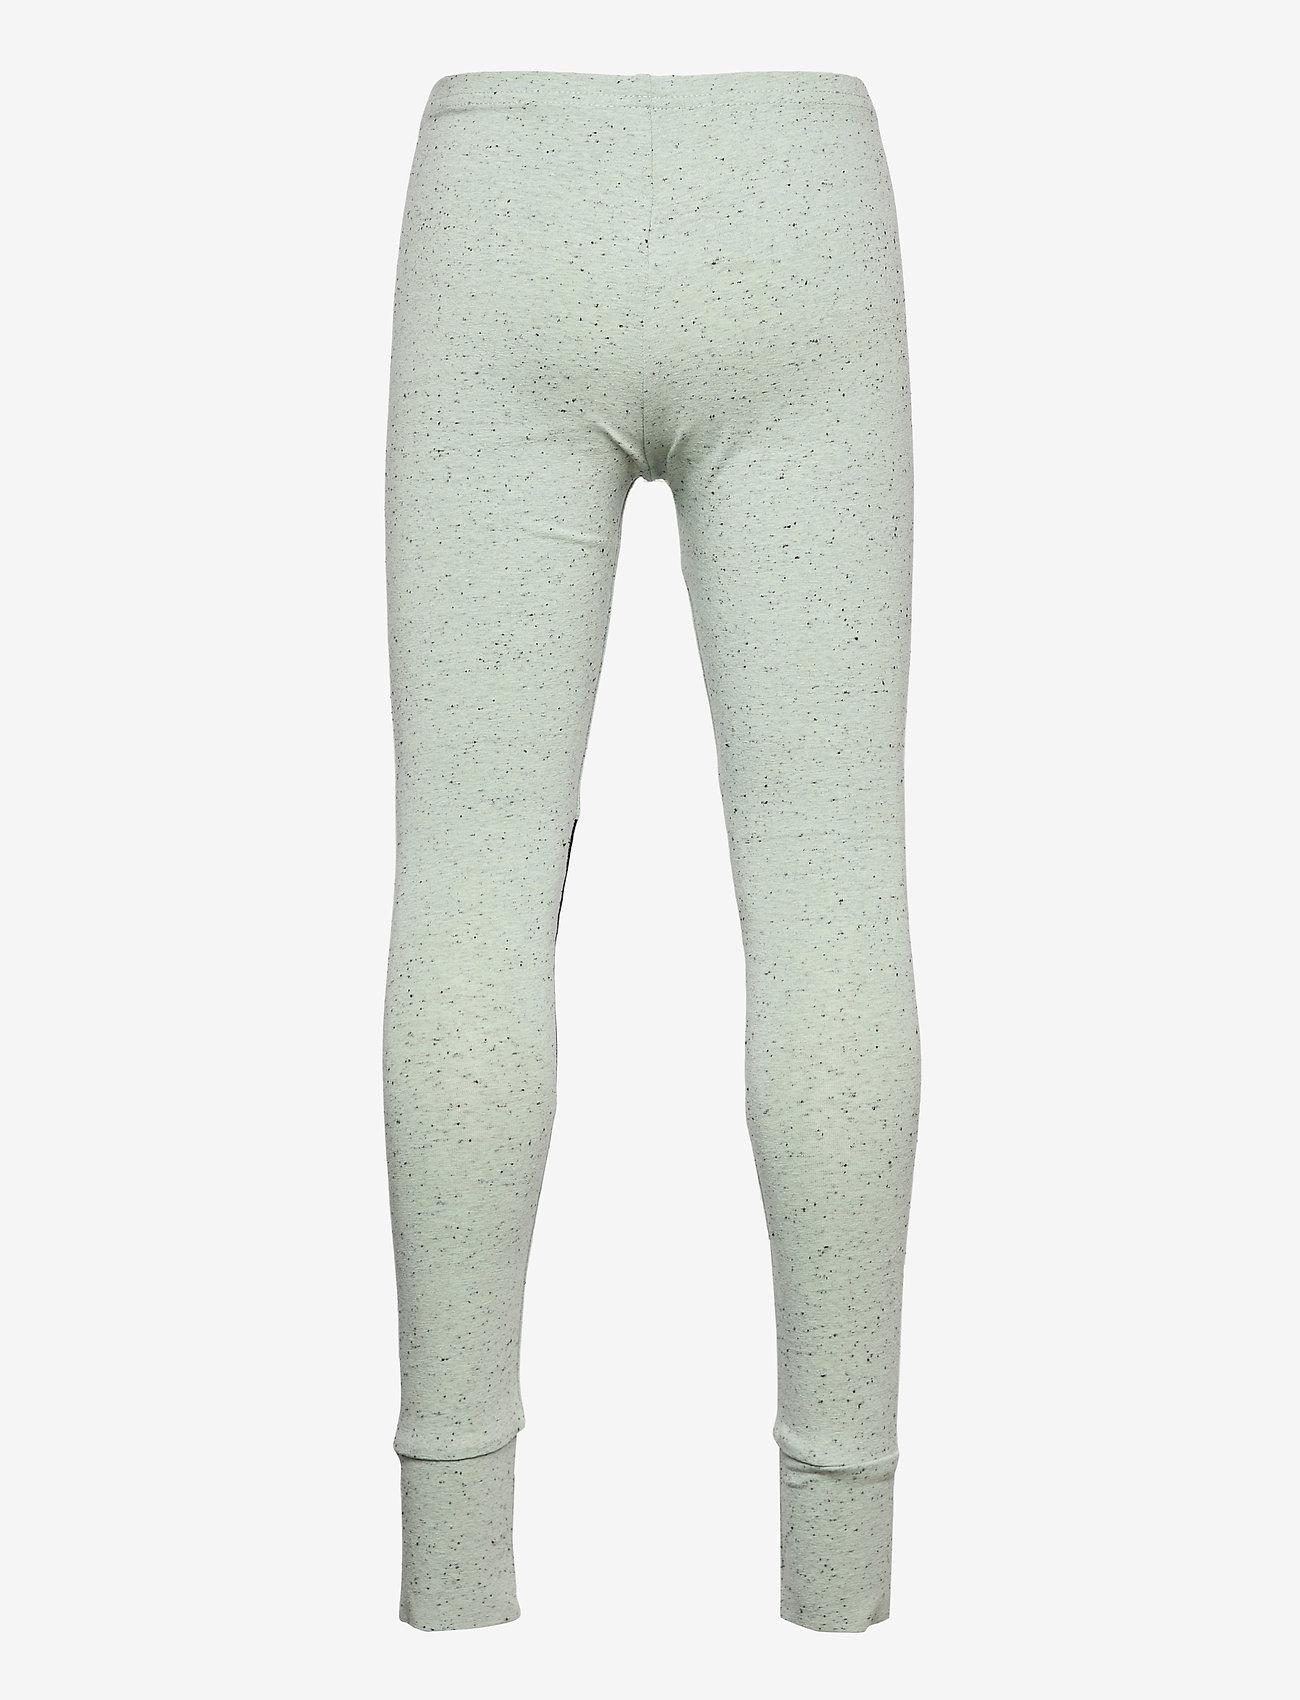 Papu - Patch leggings - leggings - melange green - 1